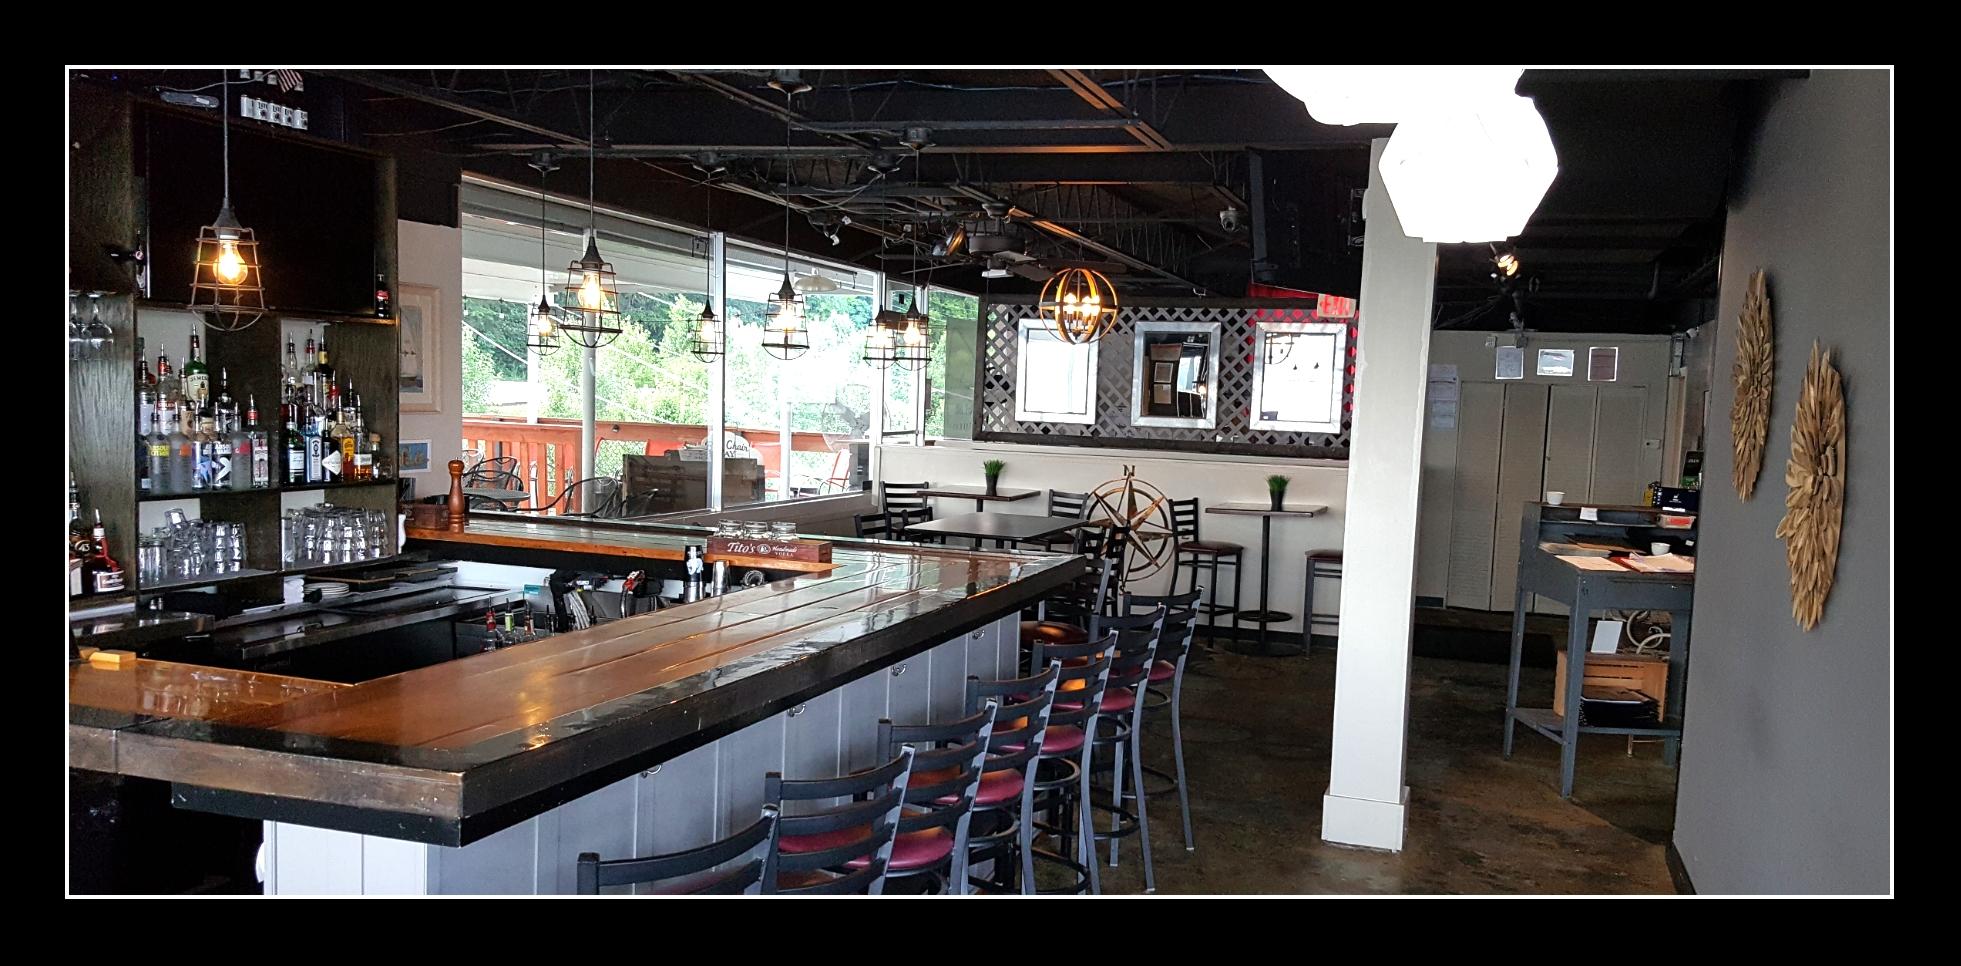 Lakeshore Grille, Chattanooga Restaurant Serving Steaks